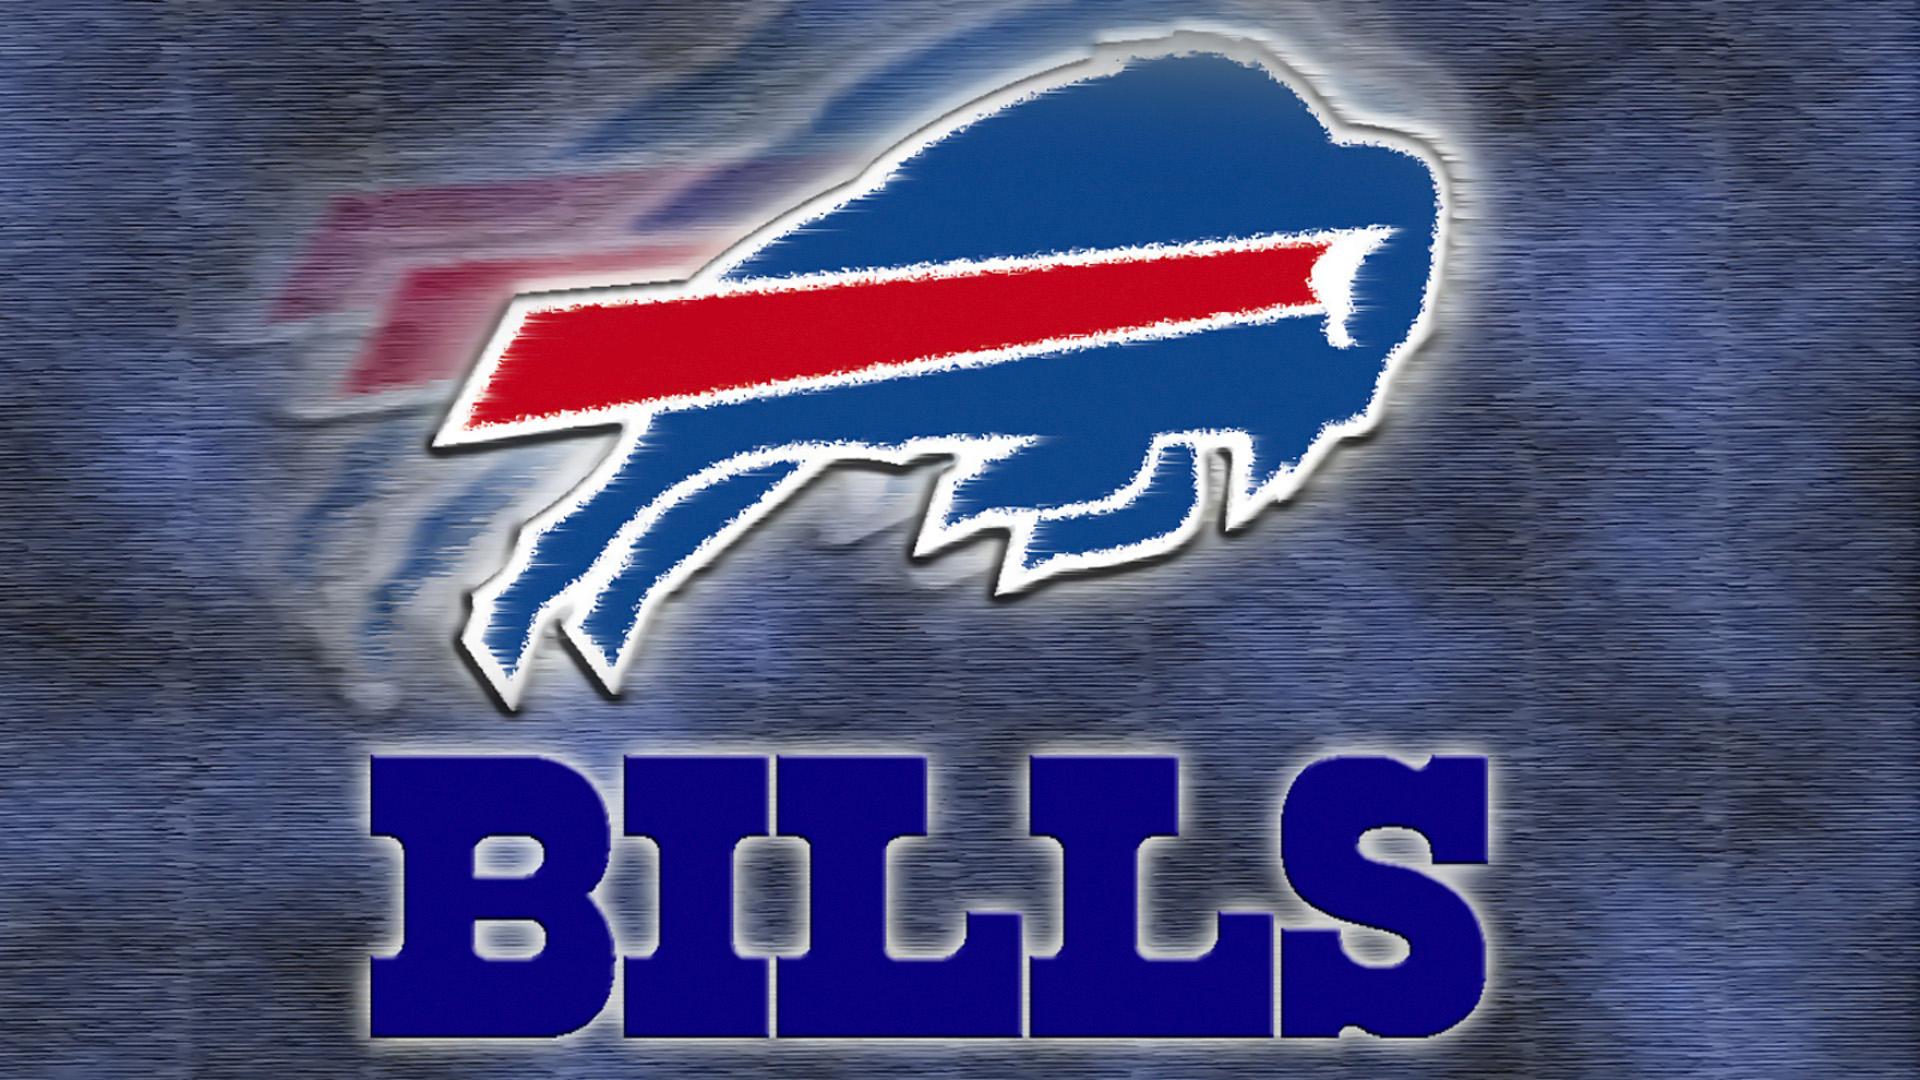 Buffalo Bills Logo wallpaper 95461 1920x1080